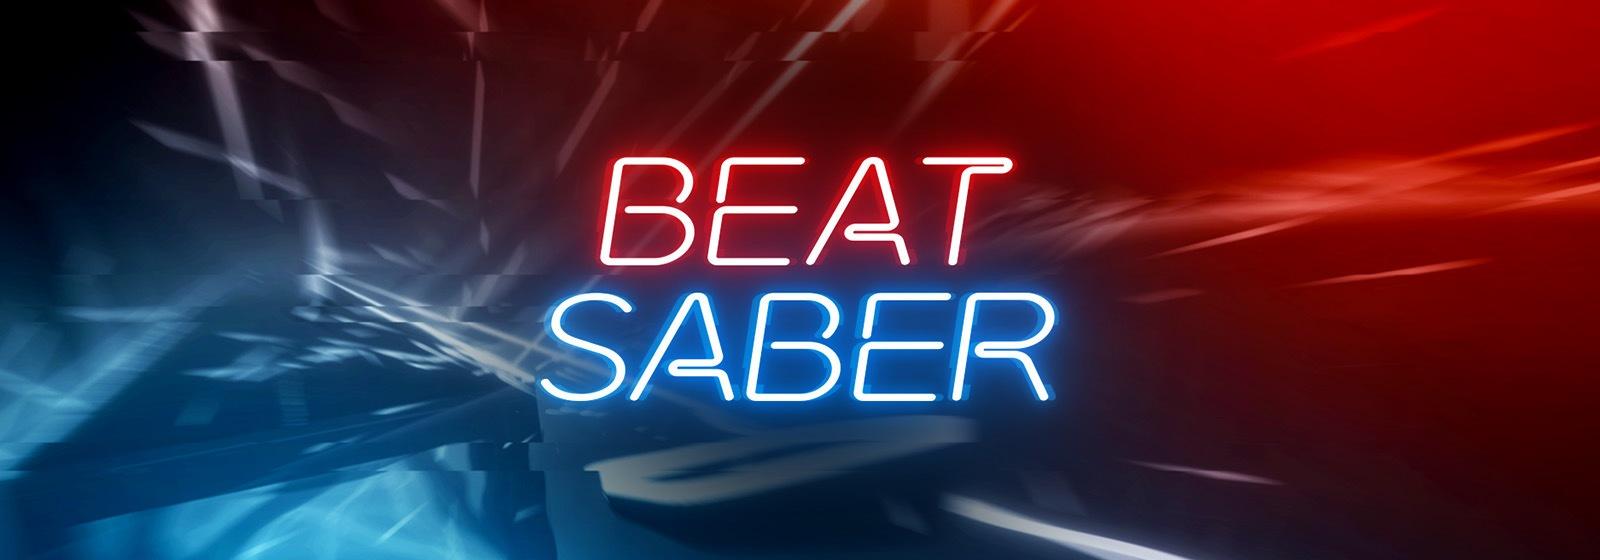 Beat Saber Apparel Store